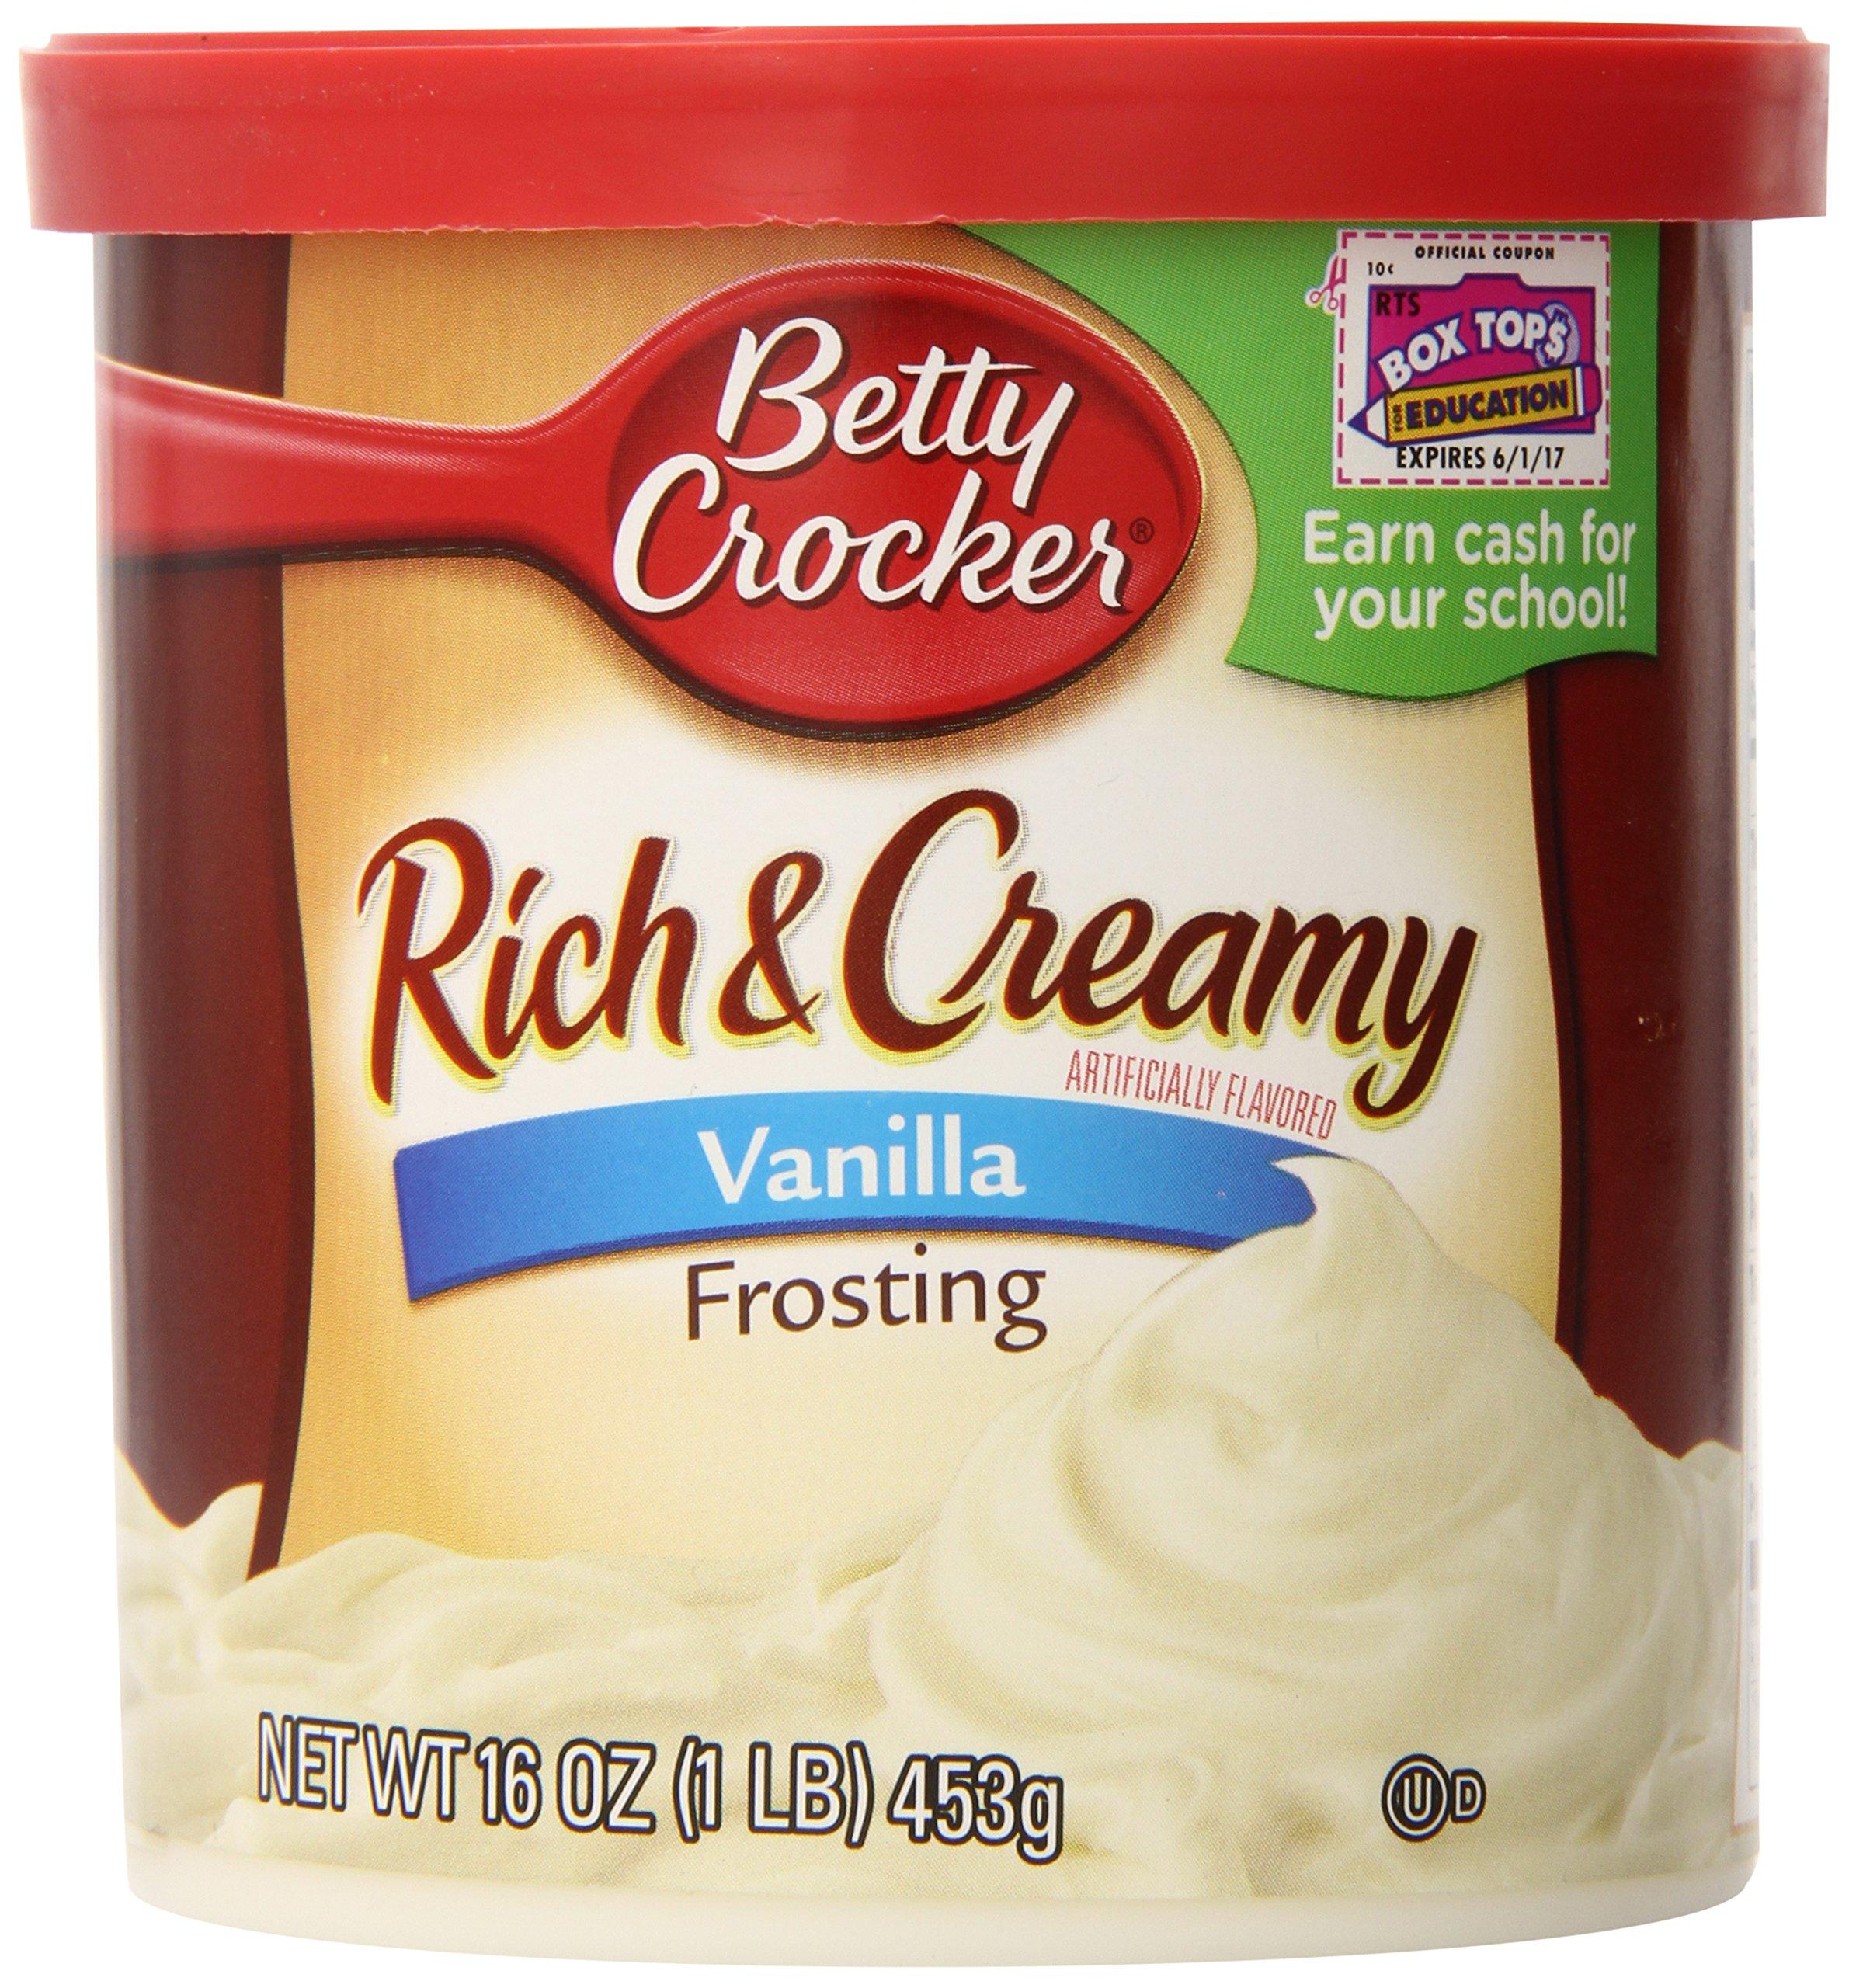 Betty Crocker Rich & Creamy Vanilla Frosting 16 oz